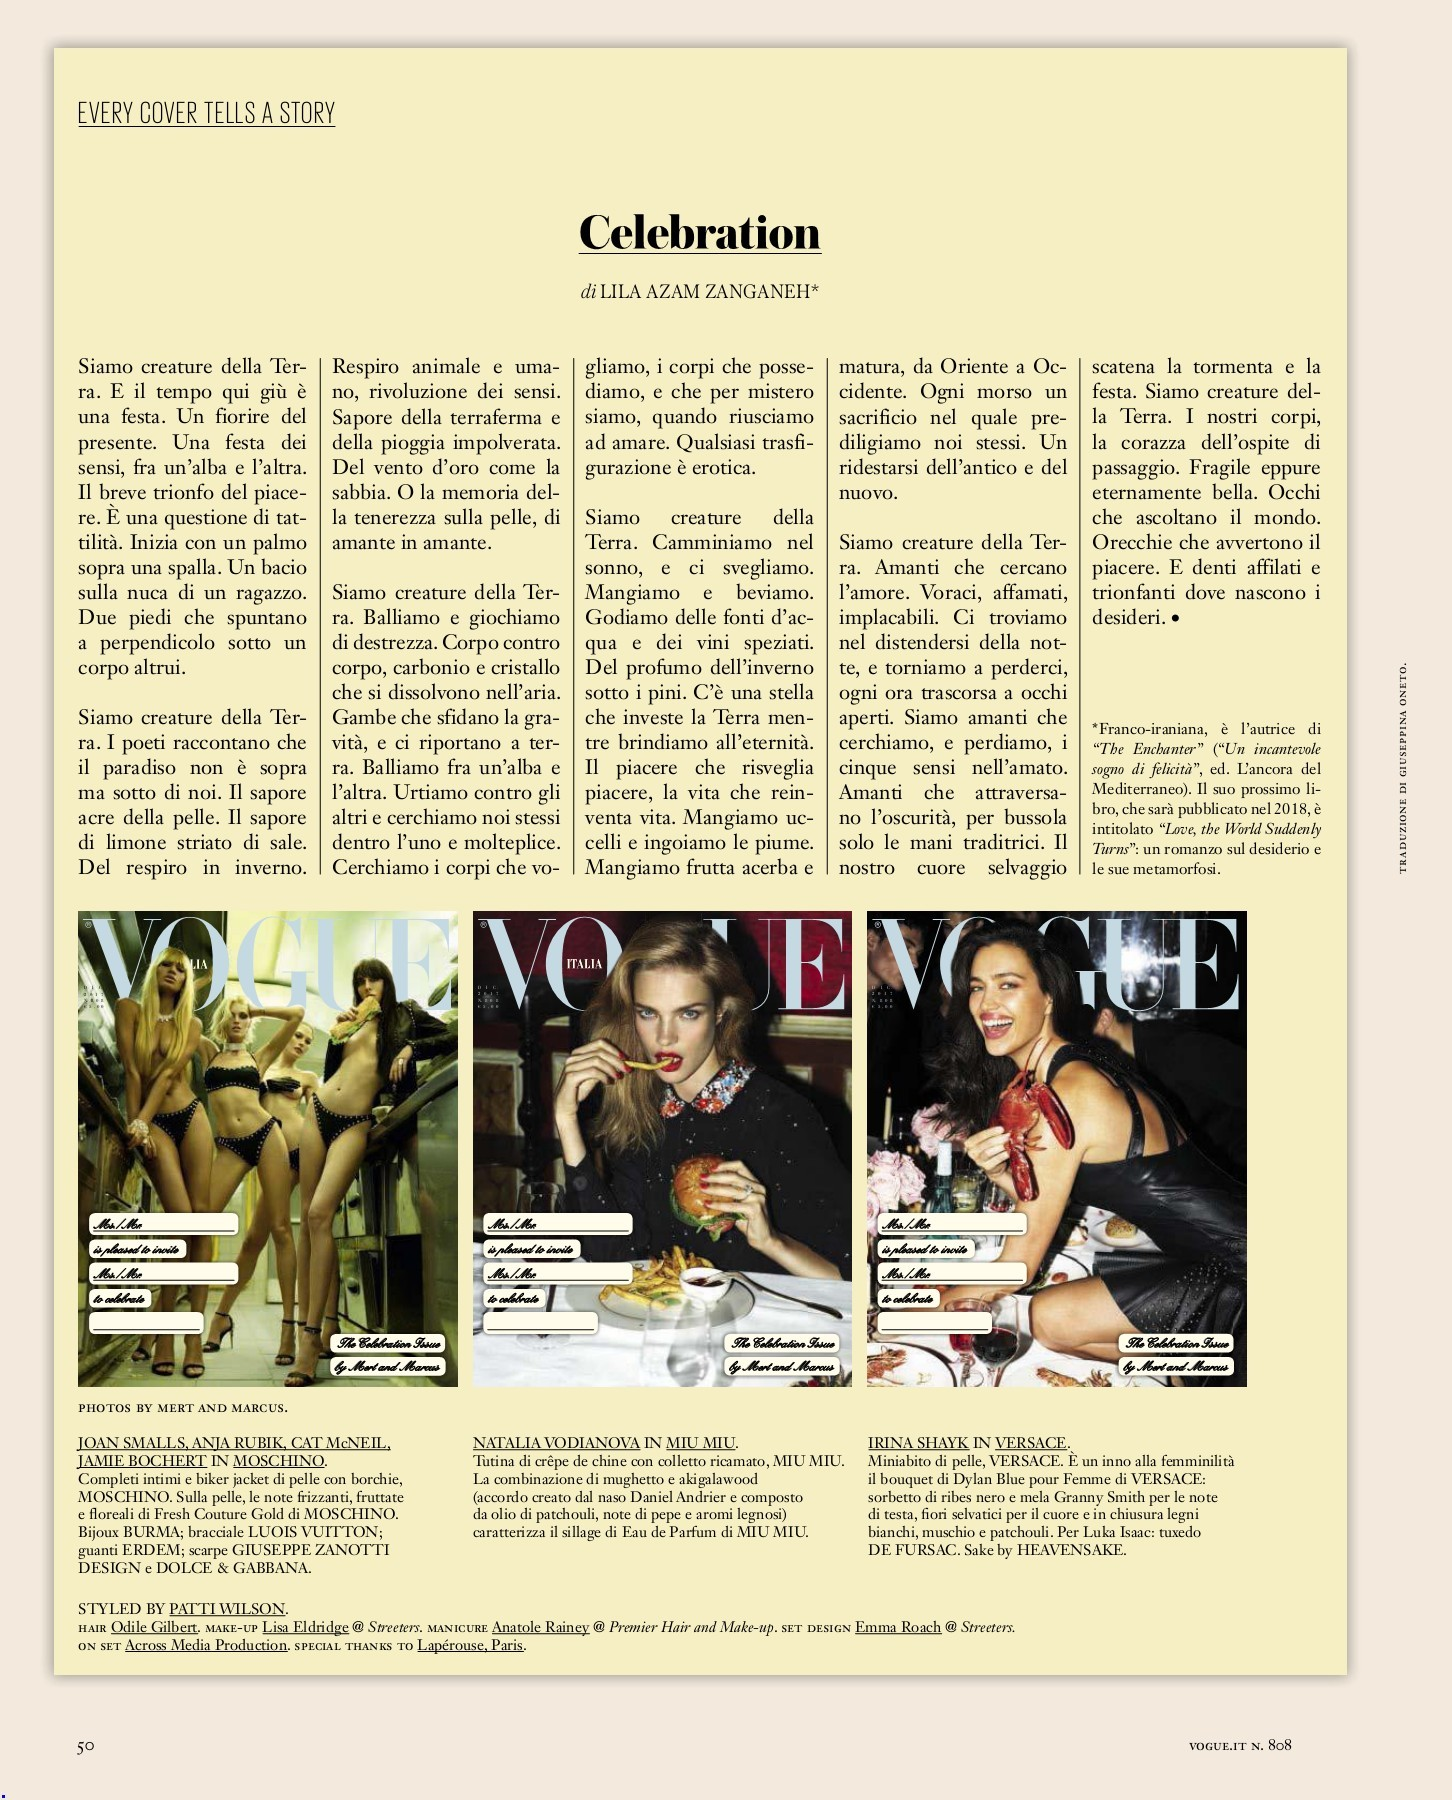 Asia Preziosi Porn Falsa Apparenza vogue italia_dic 2017-flip book pages 51-100   pubhtml5